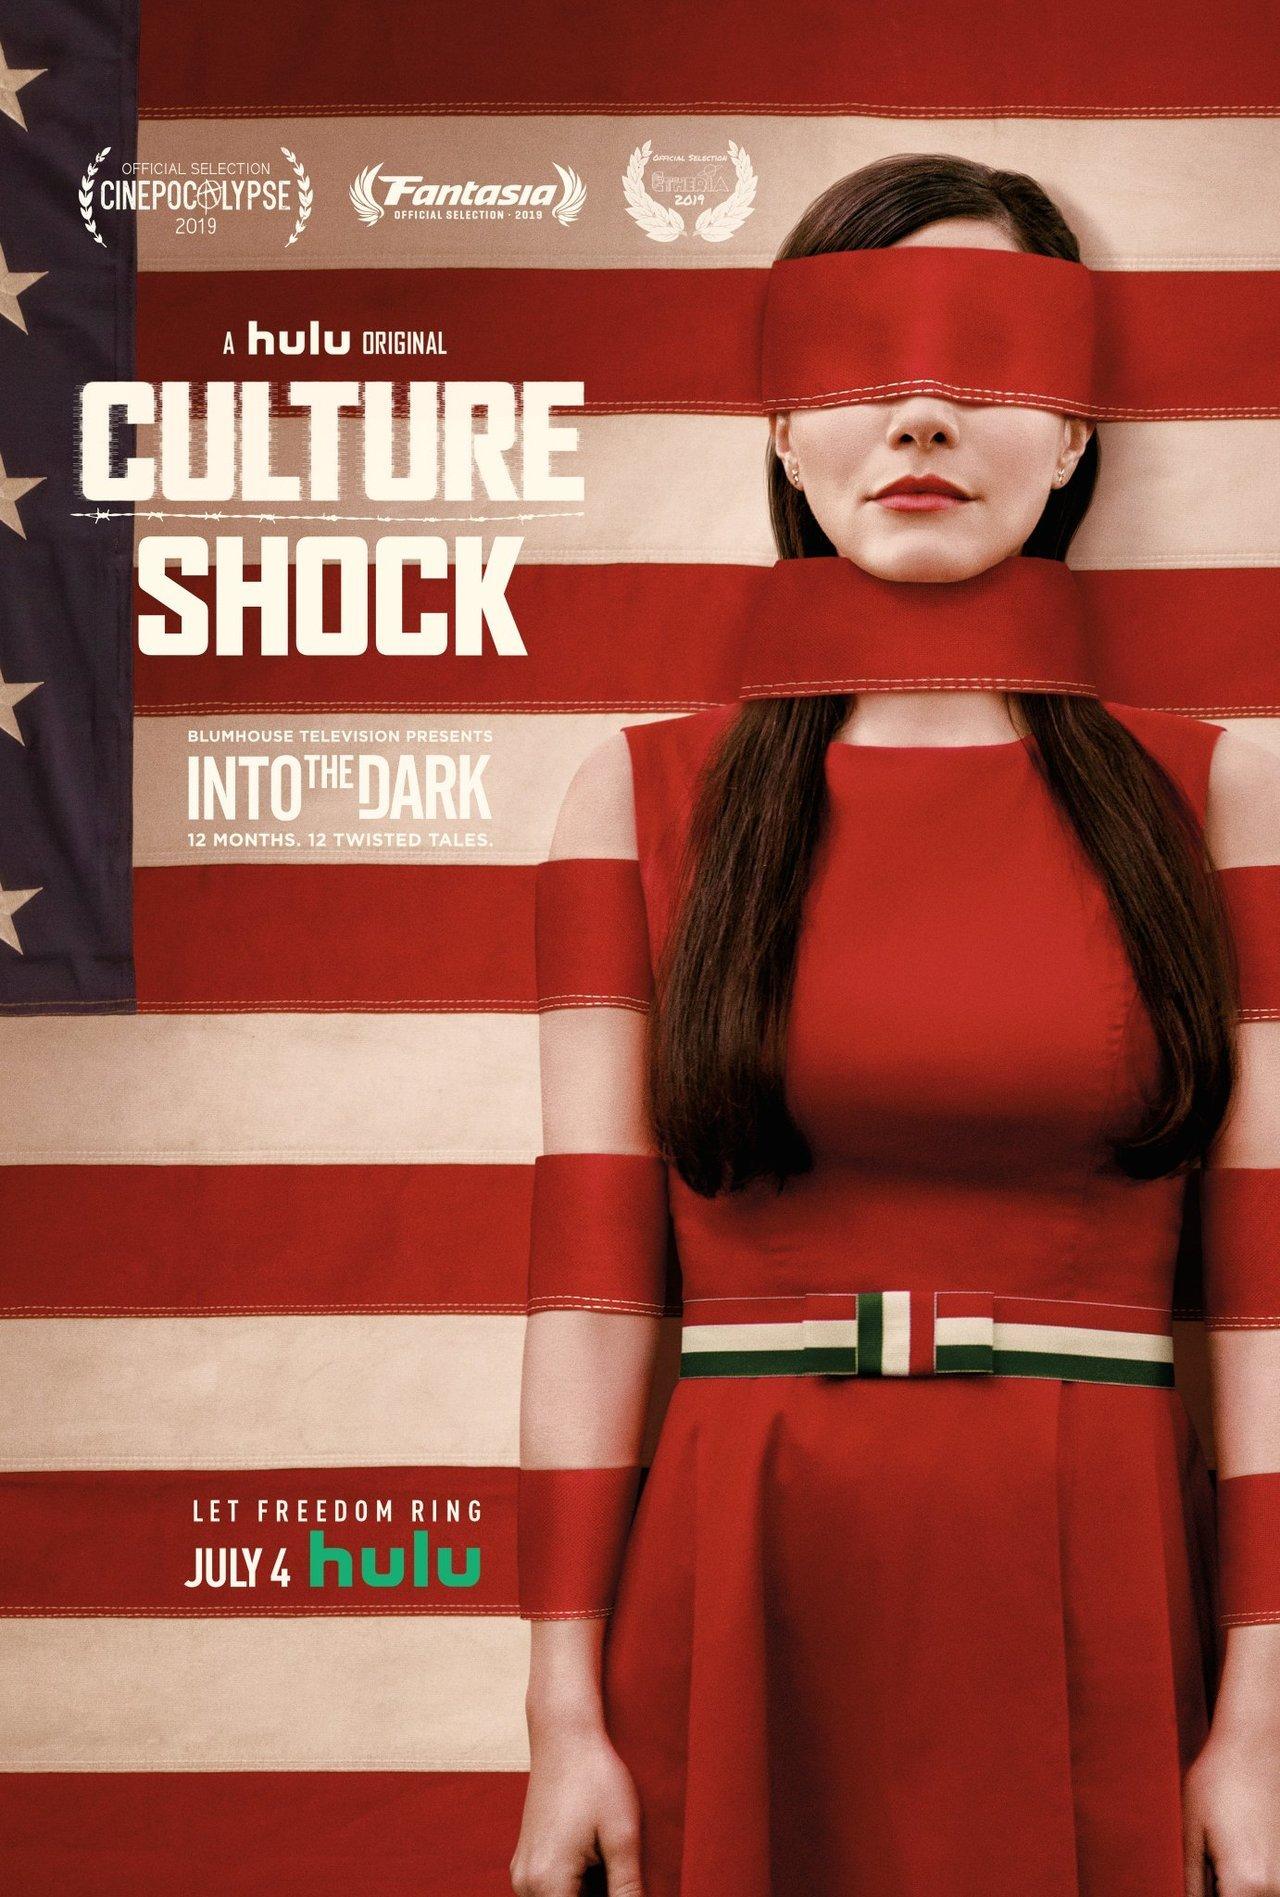 KULTŪRINIS ŠOKAS (2019) / Culture Shock